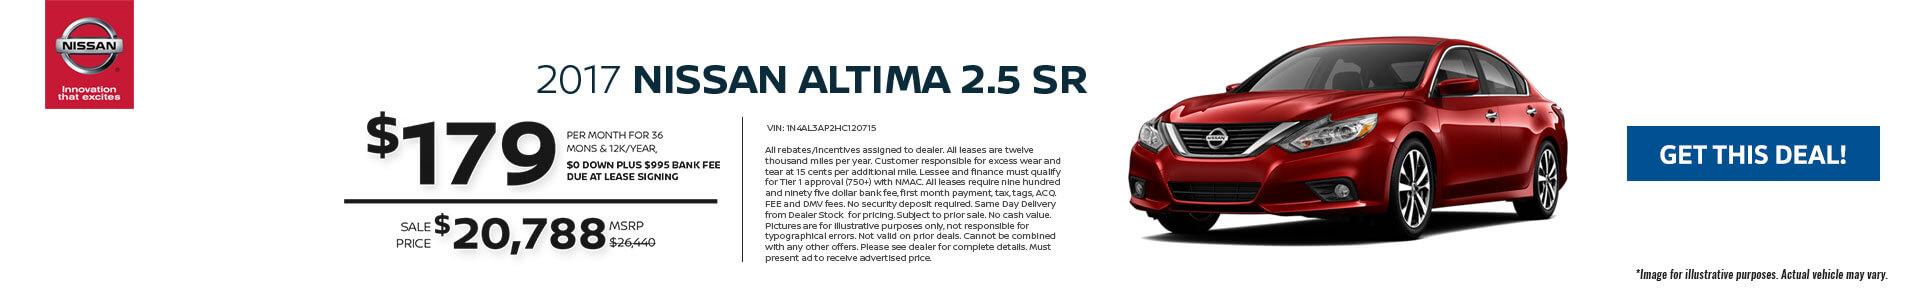 Altima SRP